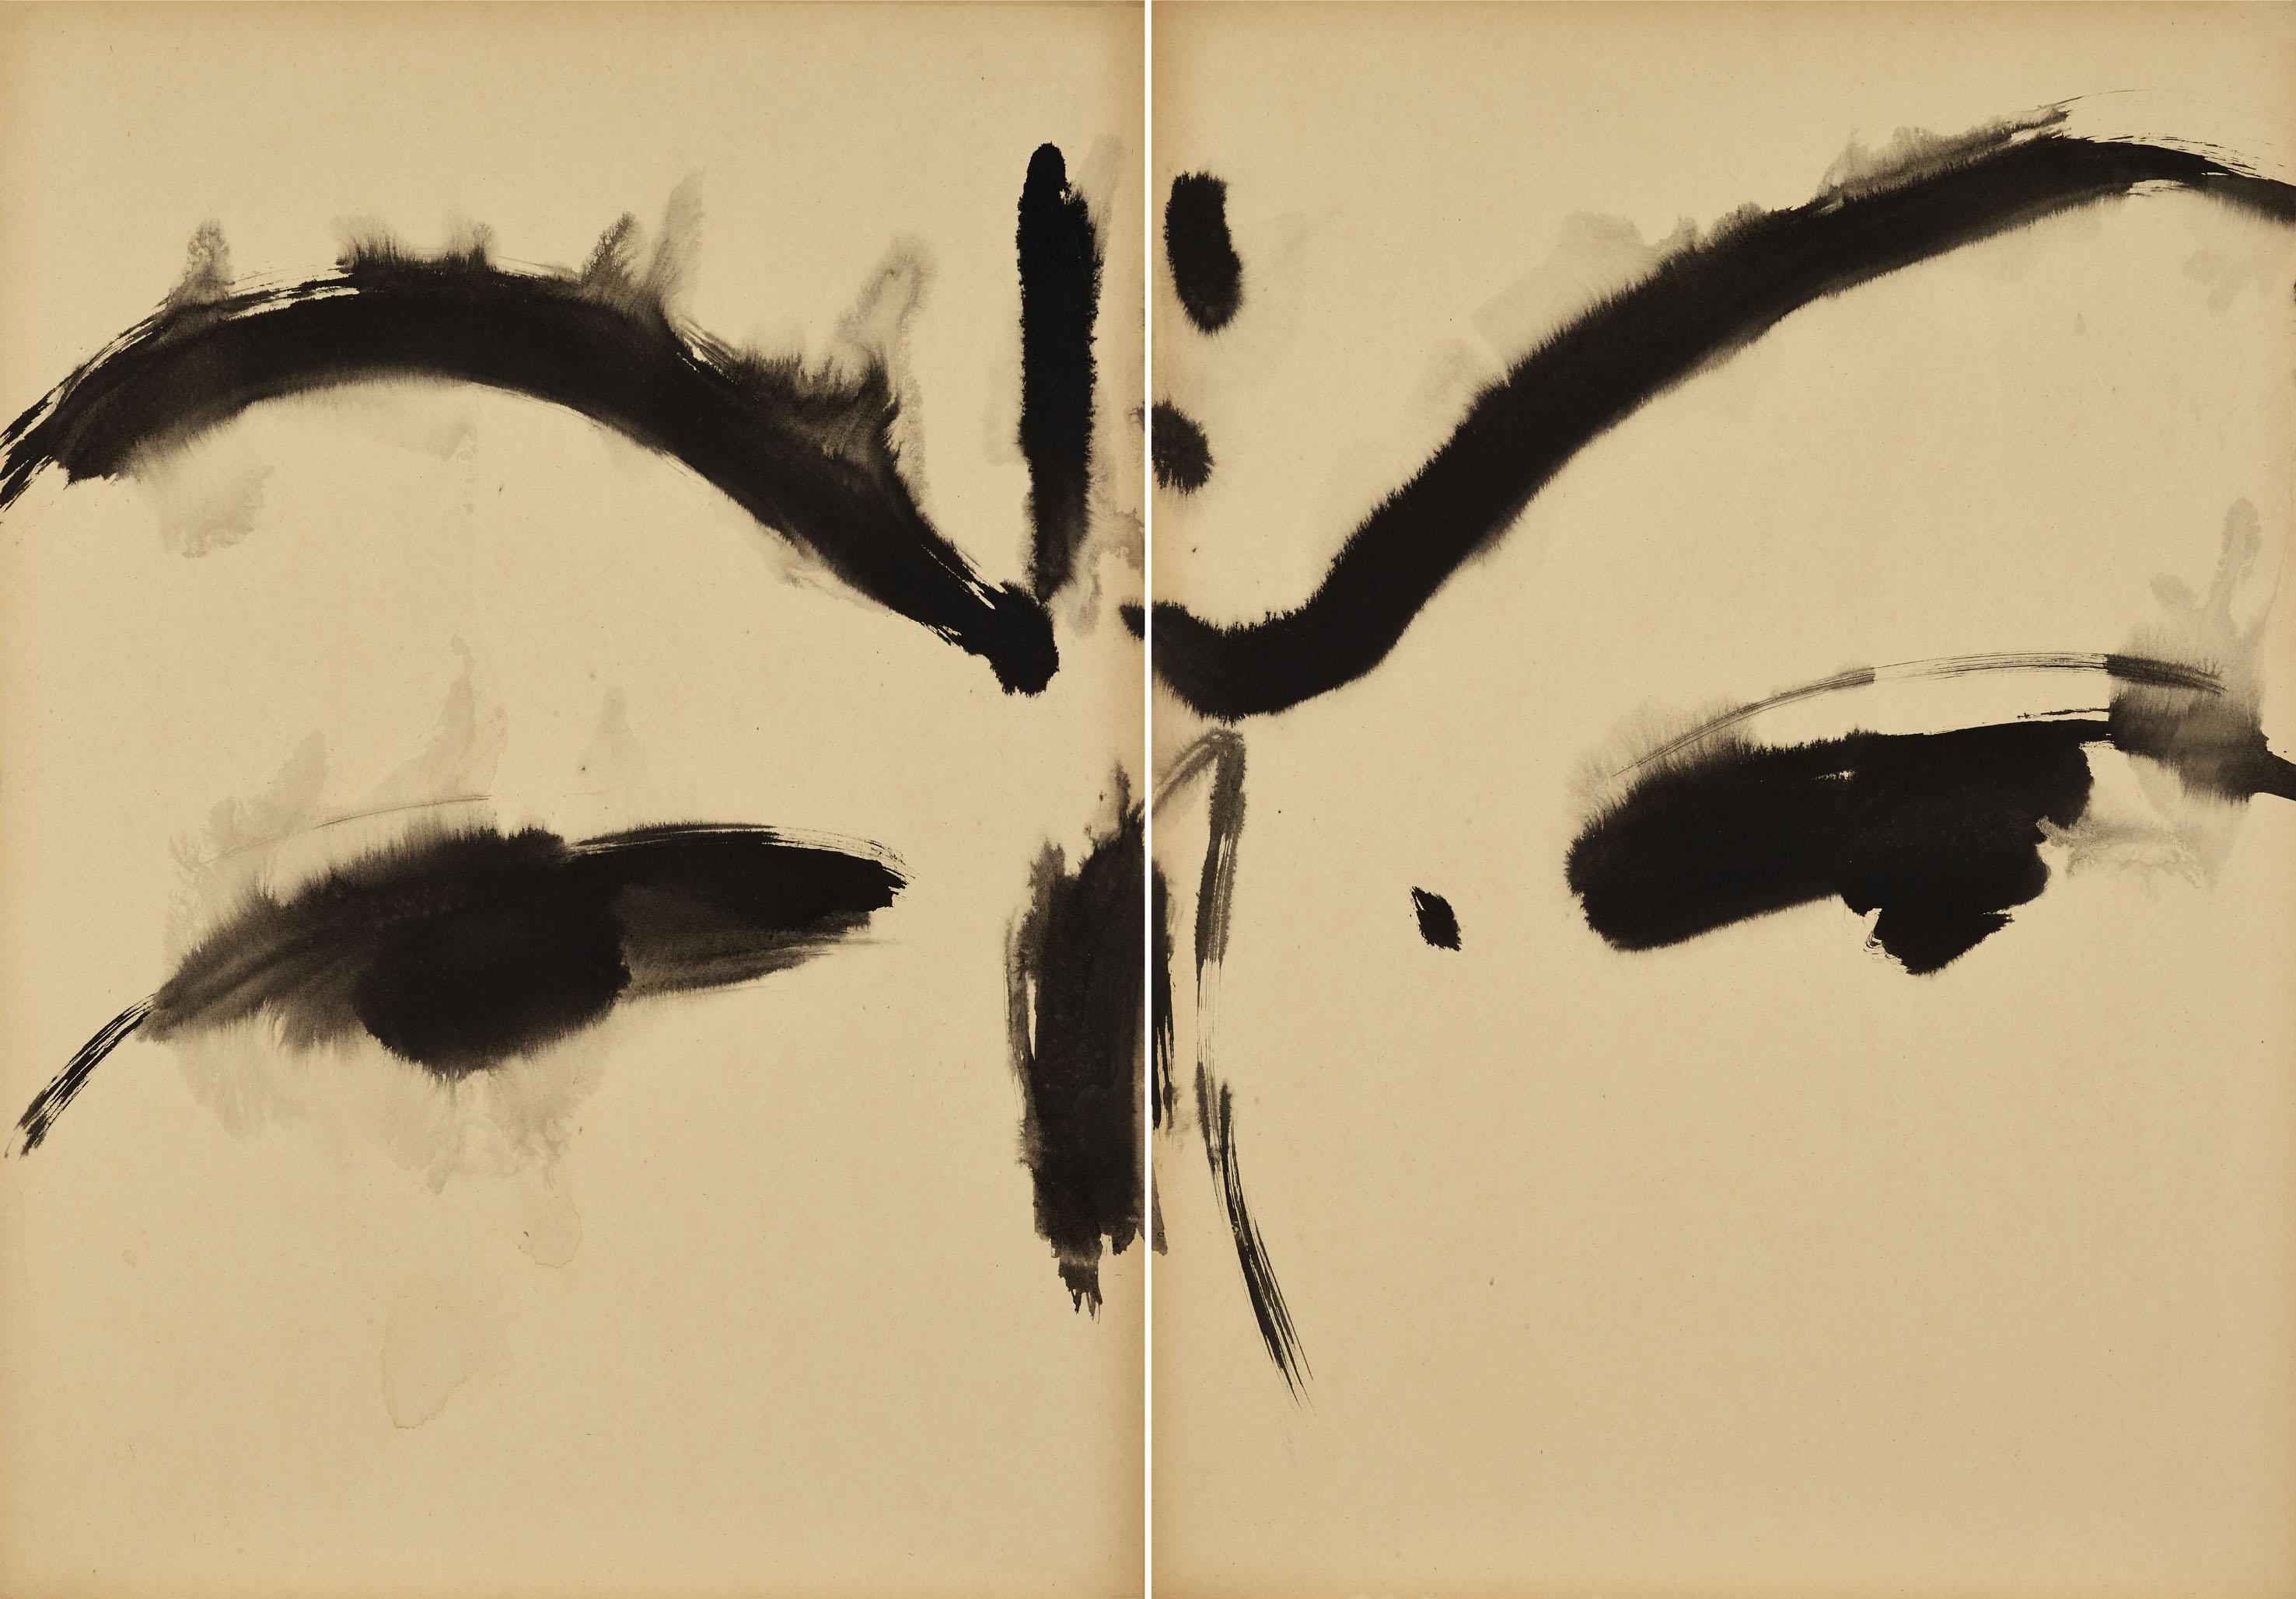 Sans titre, visage-paysage, circa 1968, encre sur carton Kyro, diptyque 70x100 cm